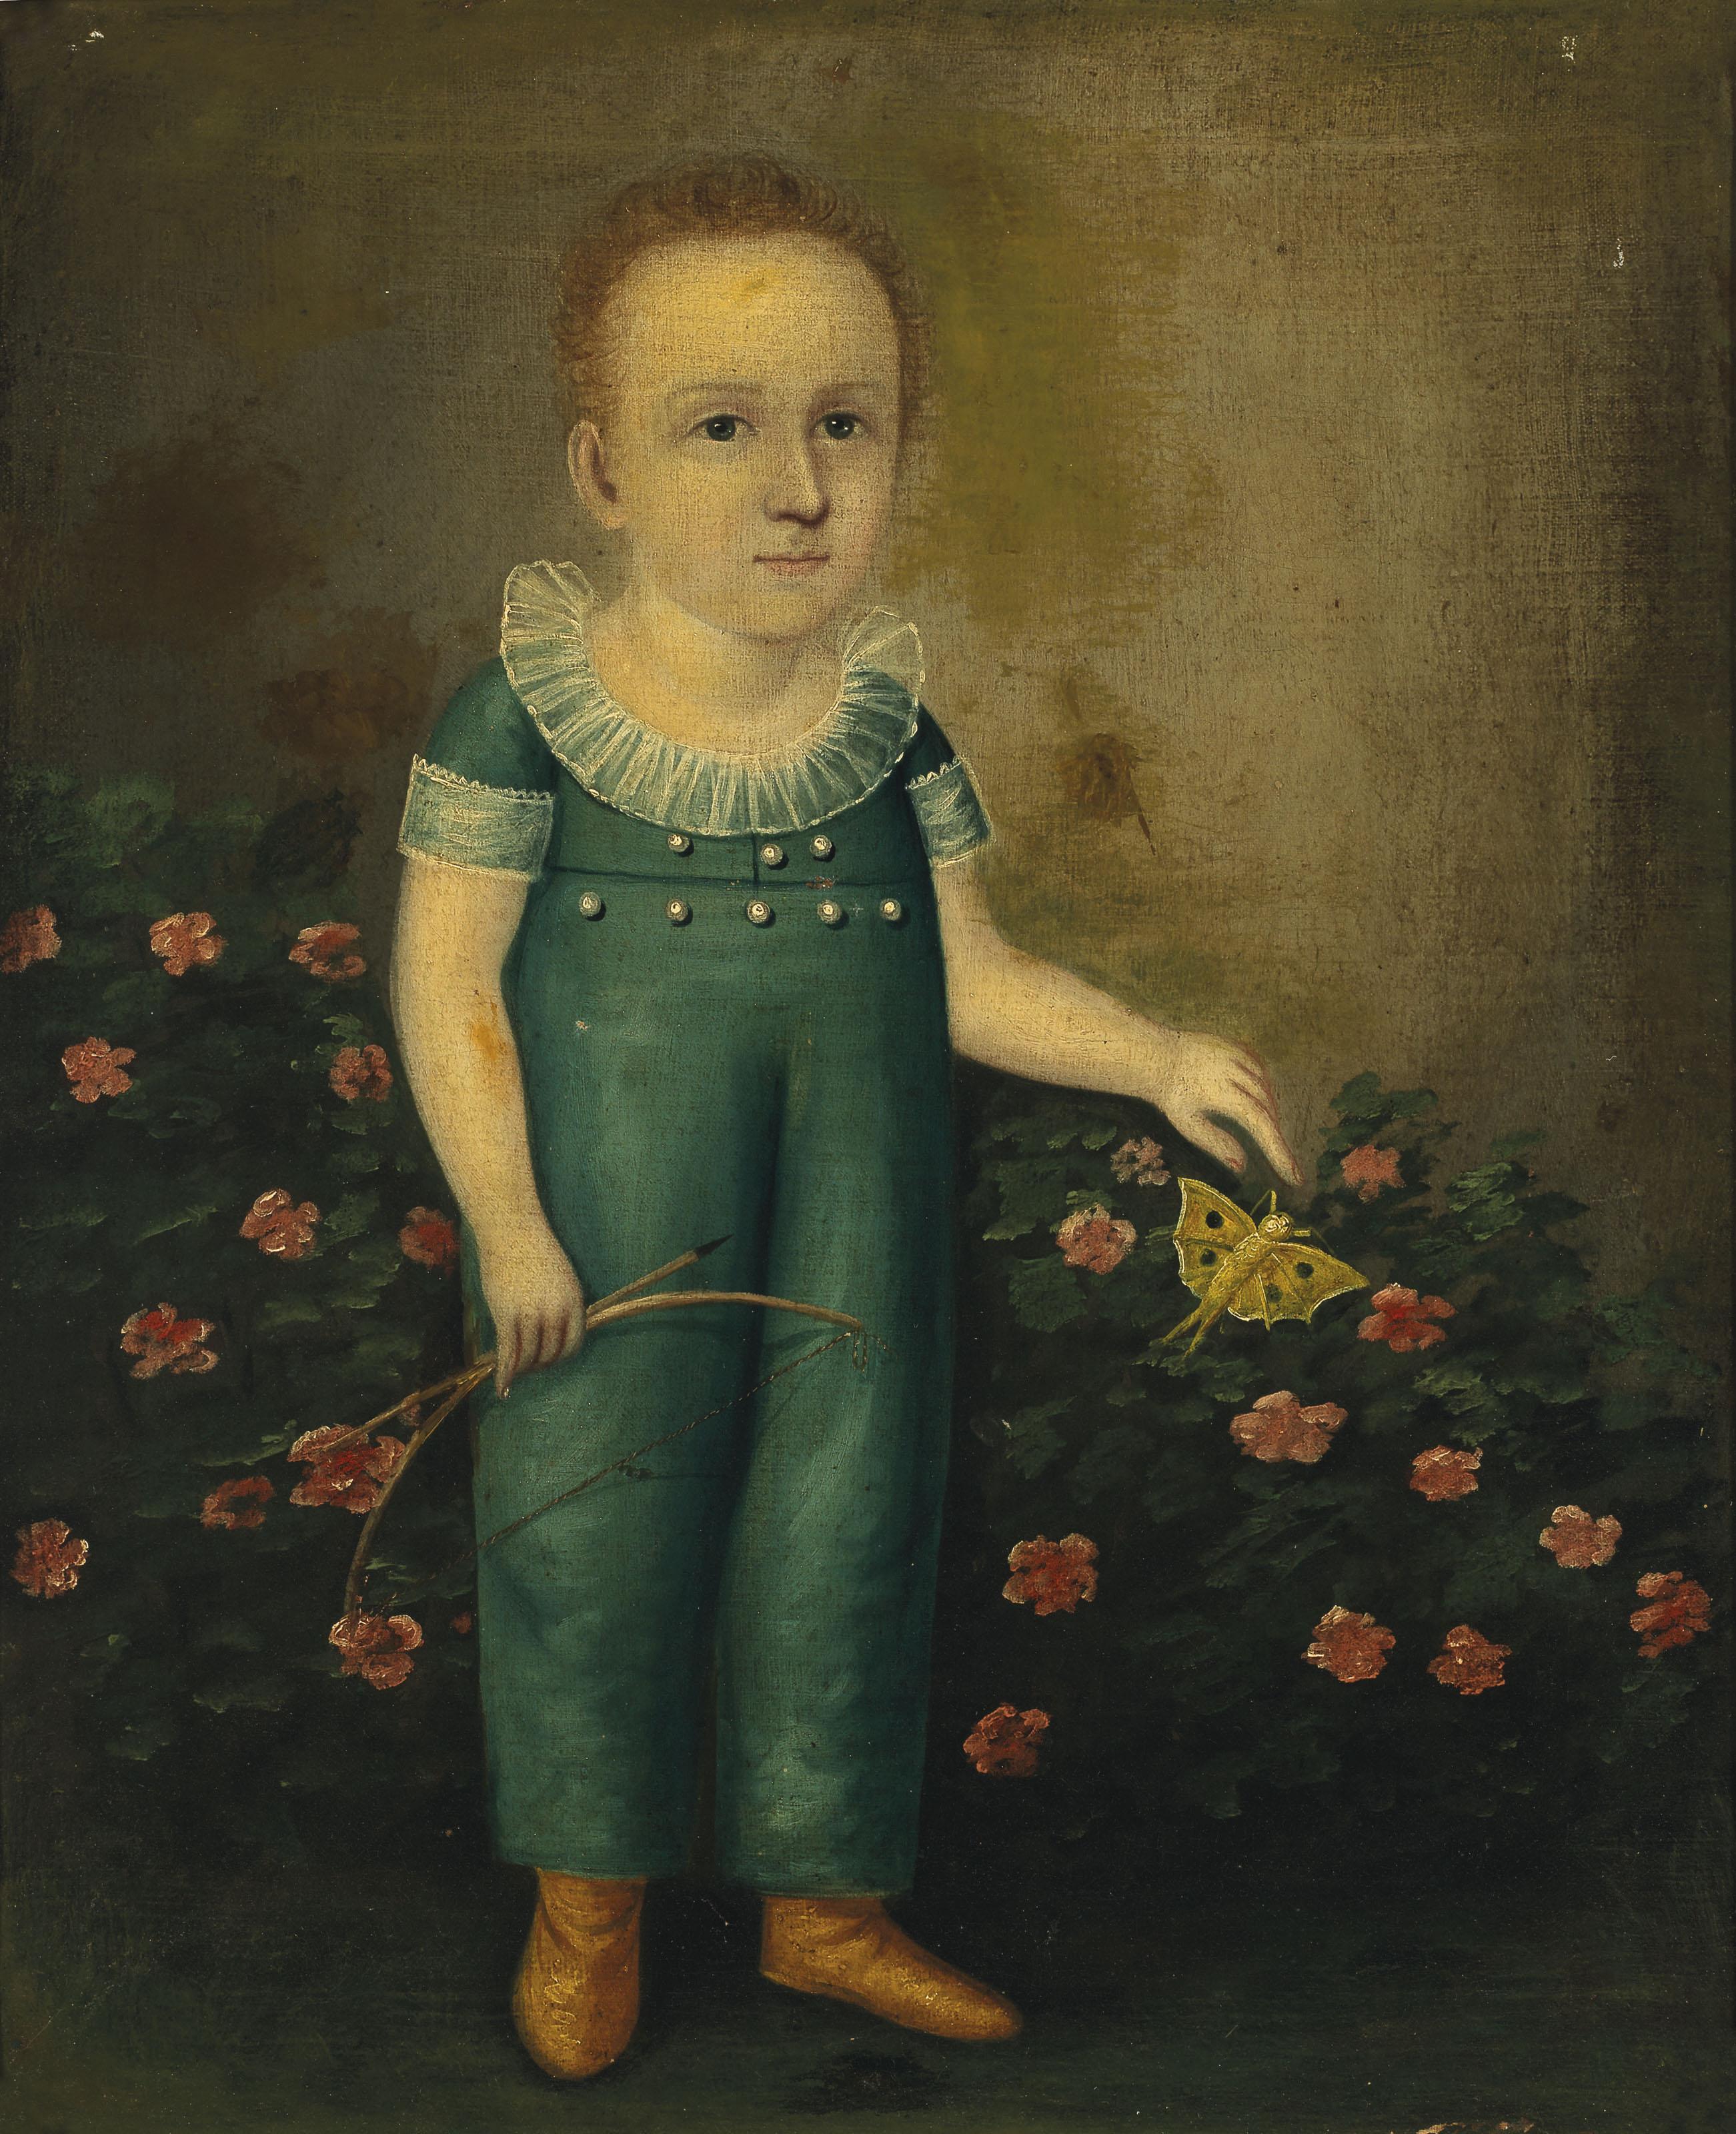 Joshua Johnson (c.1763-after 1824)